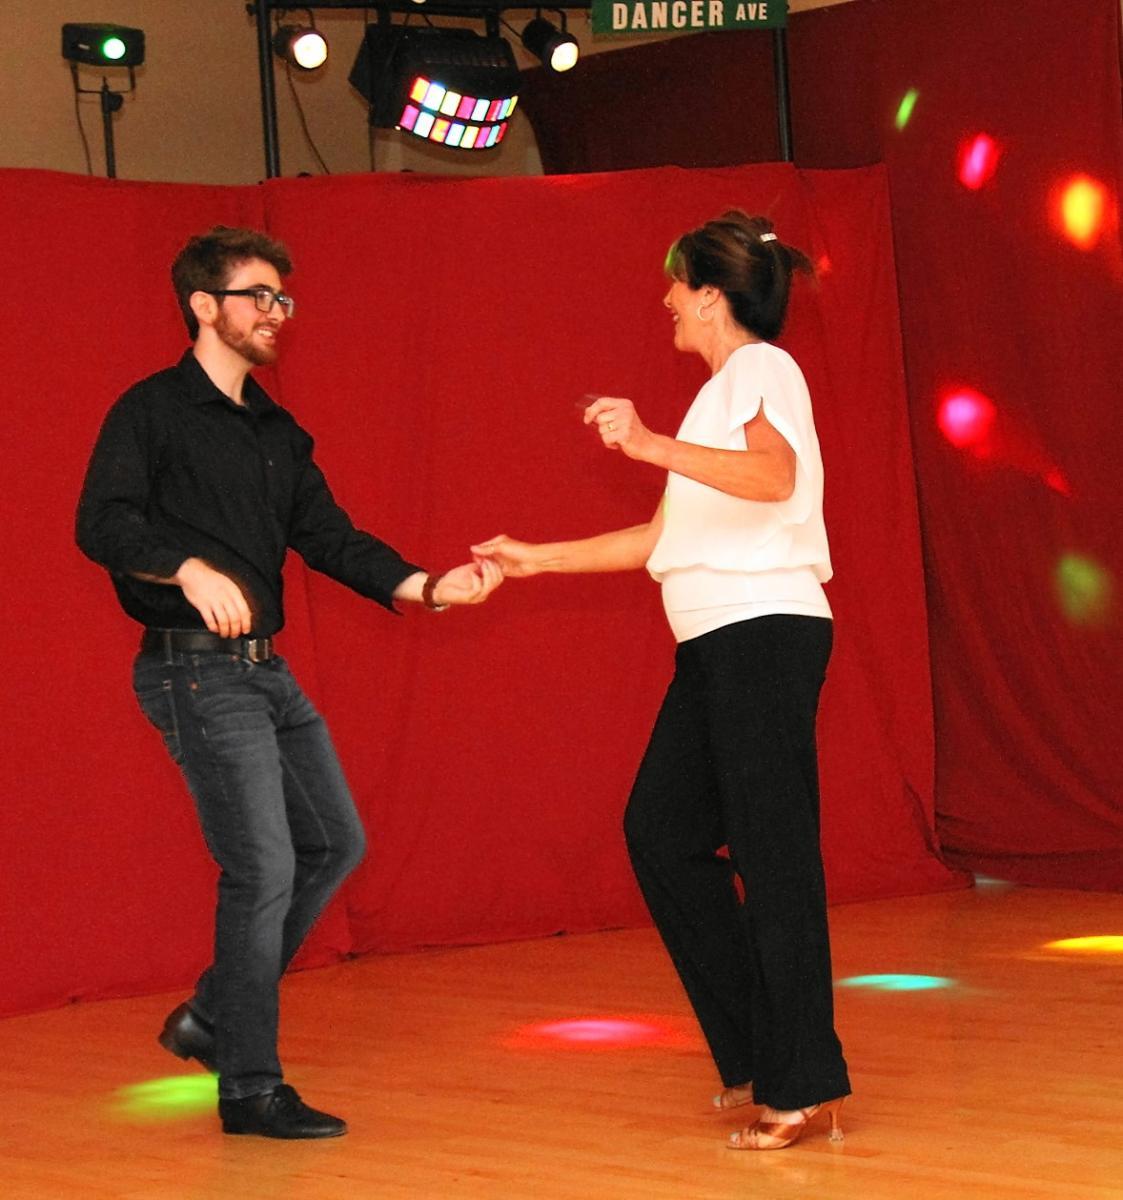 Dance studios - Enjoy Ballroom, Latin, social and competitive ballroom dancing in Memphis area at Blue Suede Ballroom Dance Studio